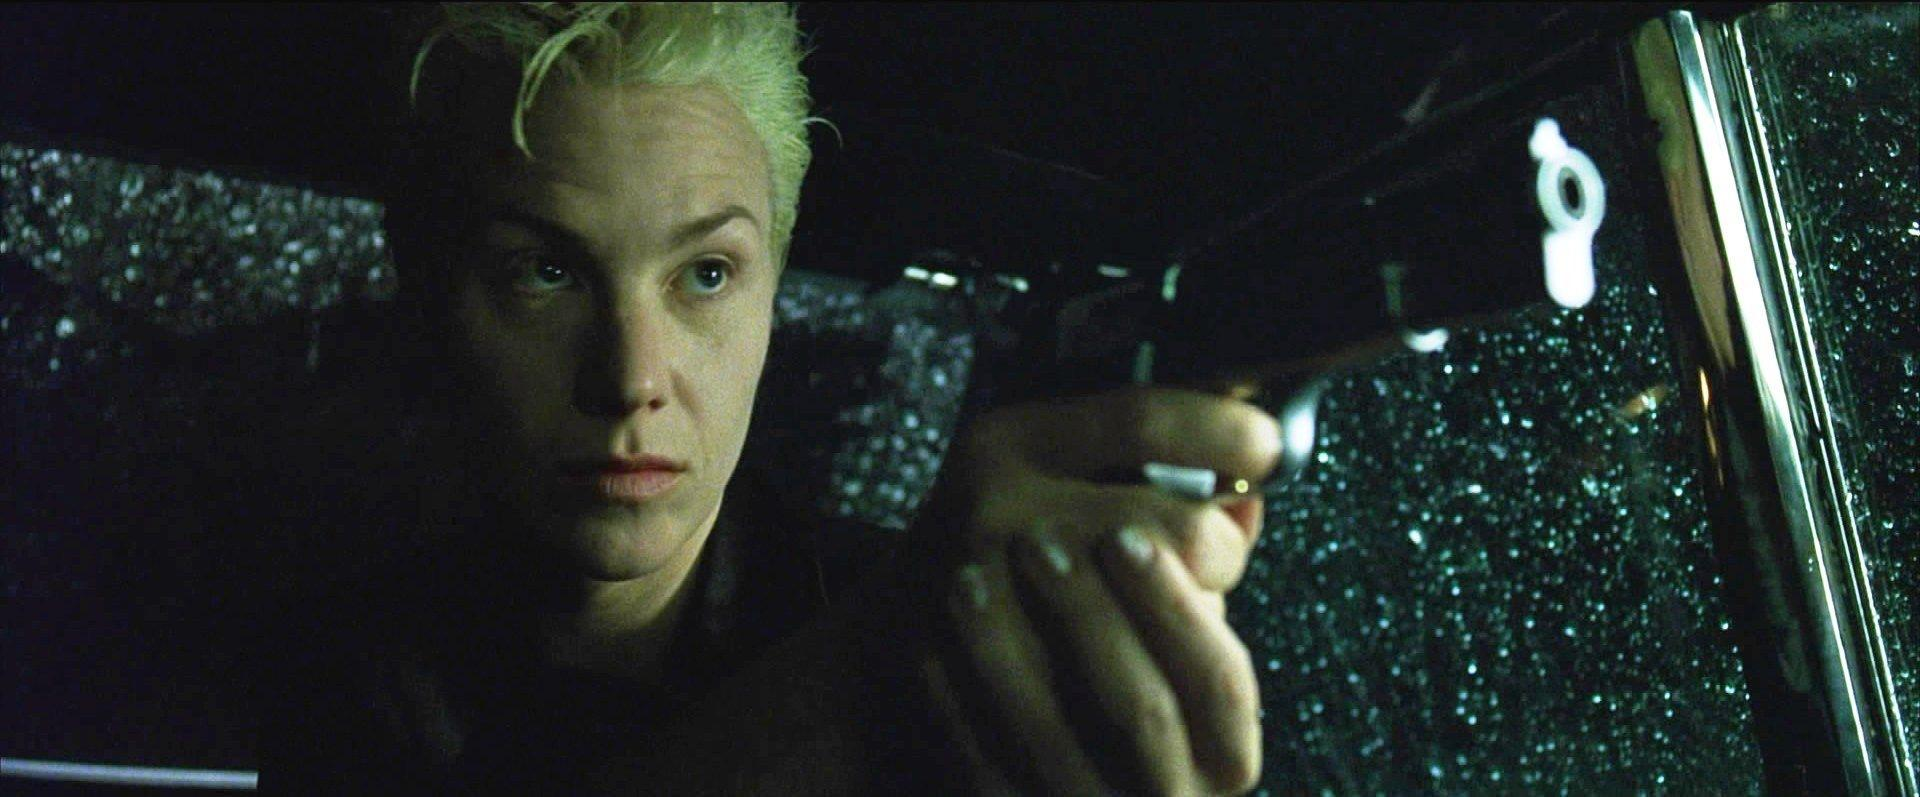 Belinda McClory as Switch in 'The Matrix'